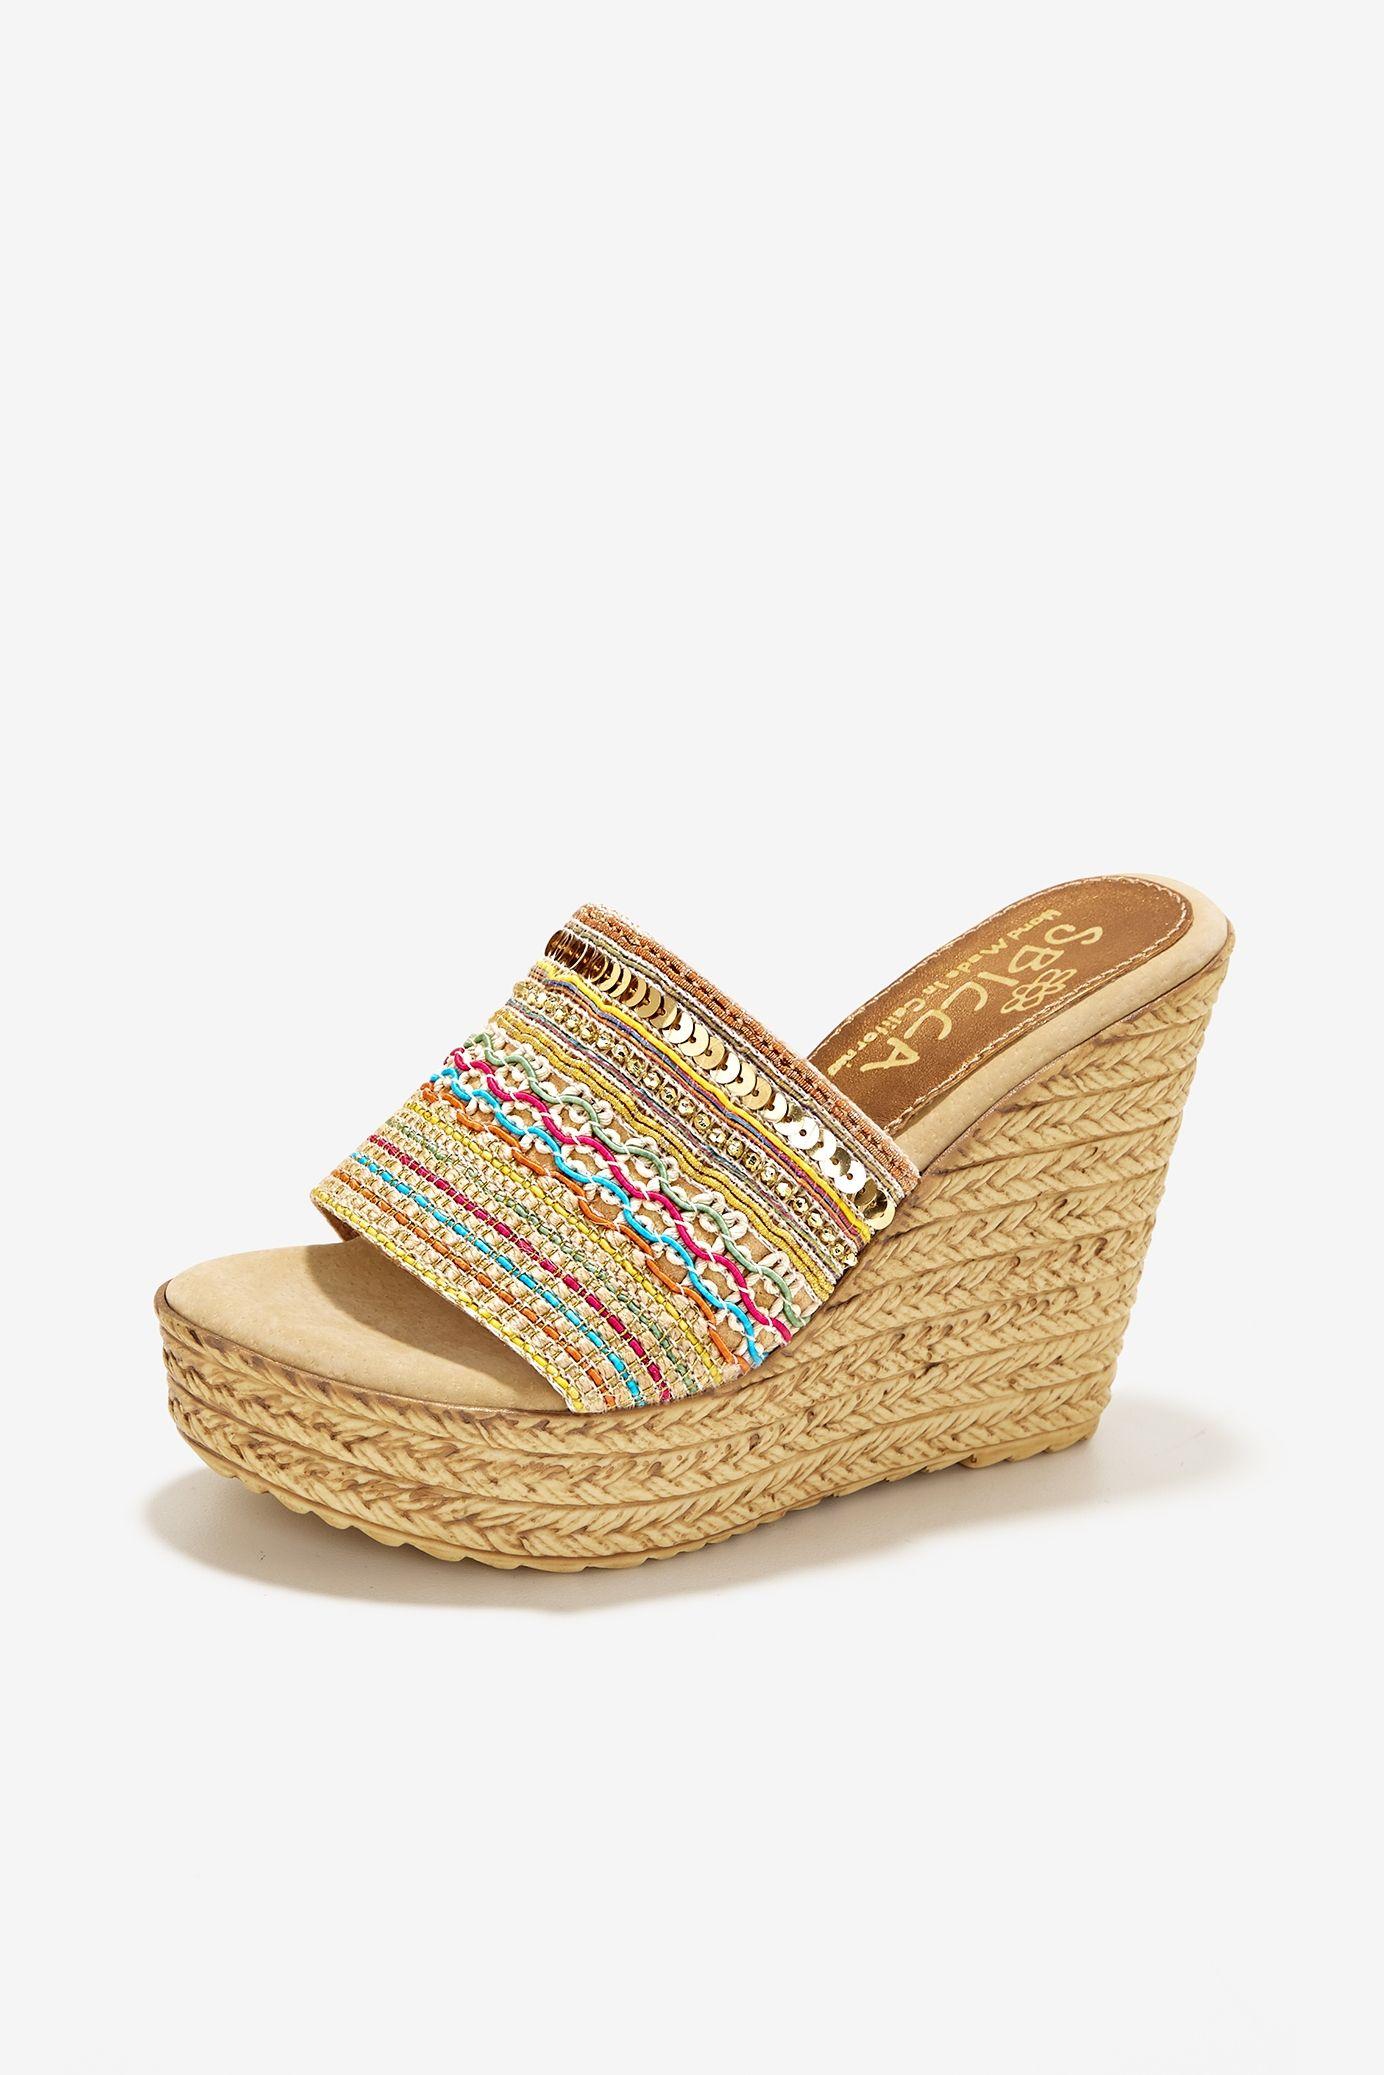 770b5b36a4dd Embellished Slide Wedge Heel